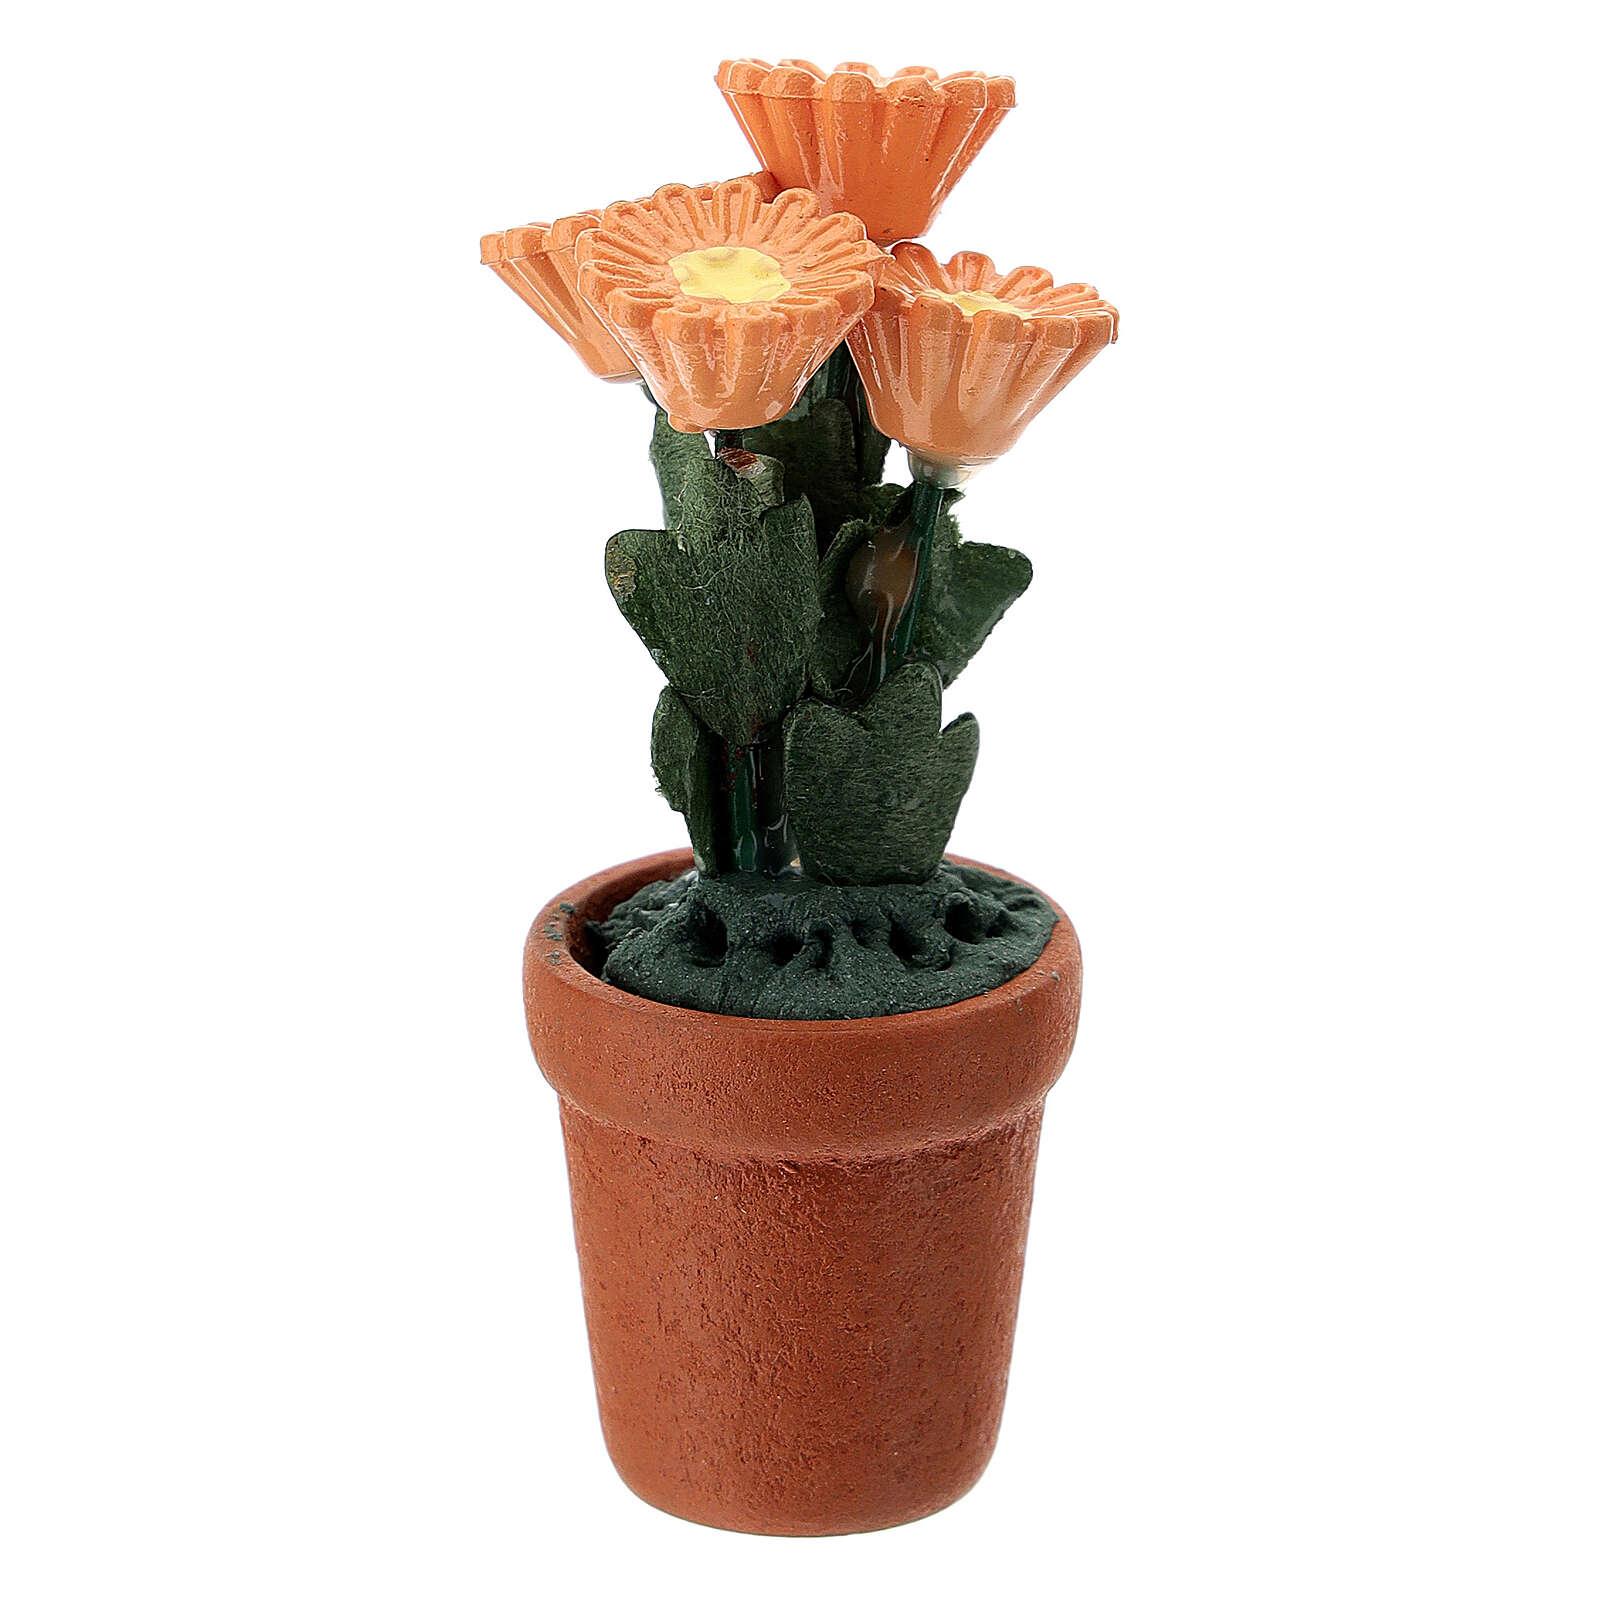 Vasetto fiori misti colorati 4x2 cm presepi 10 cm 4